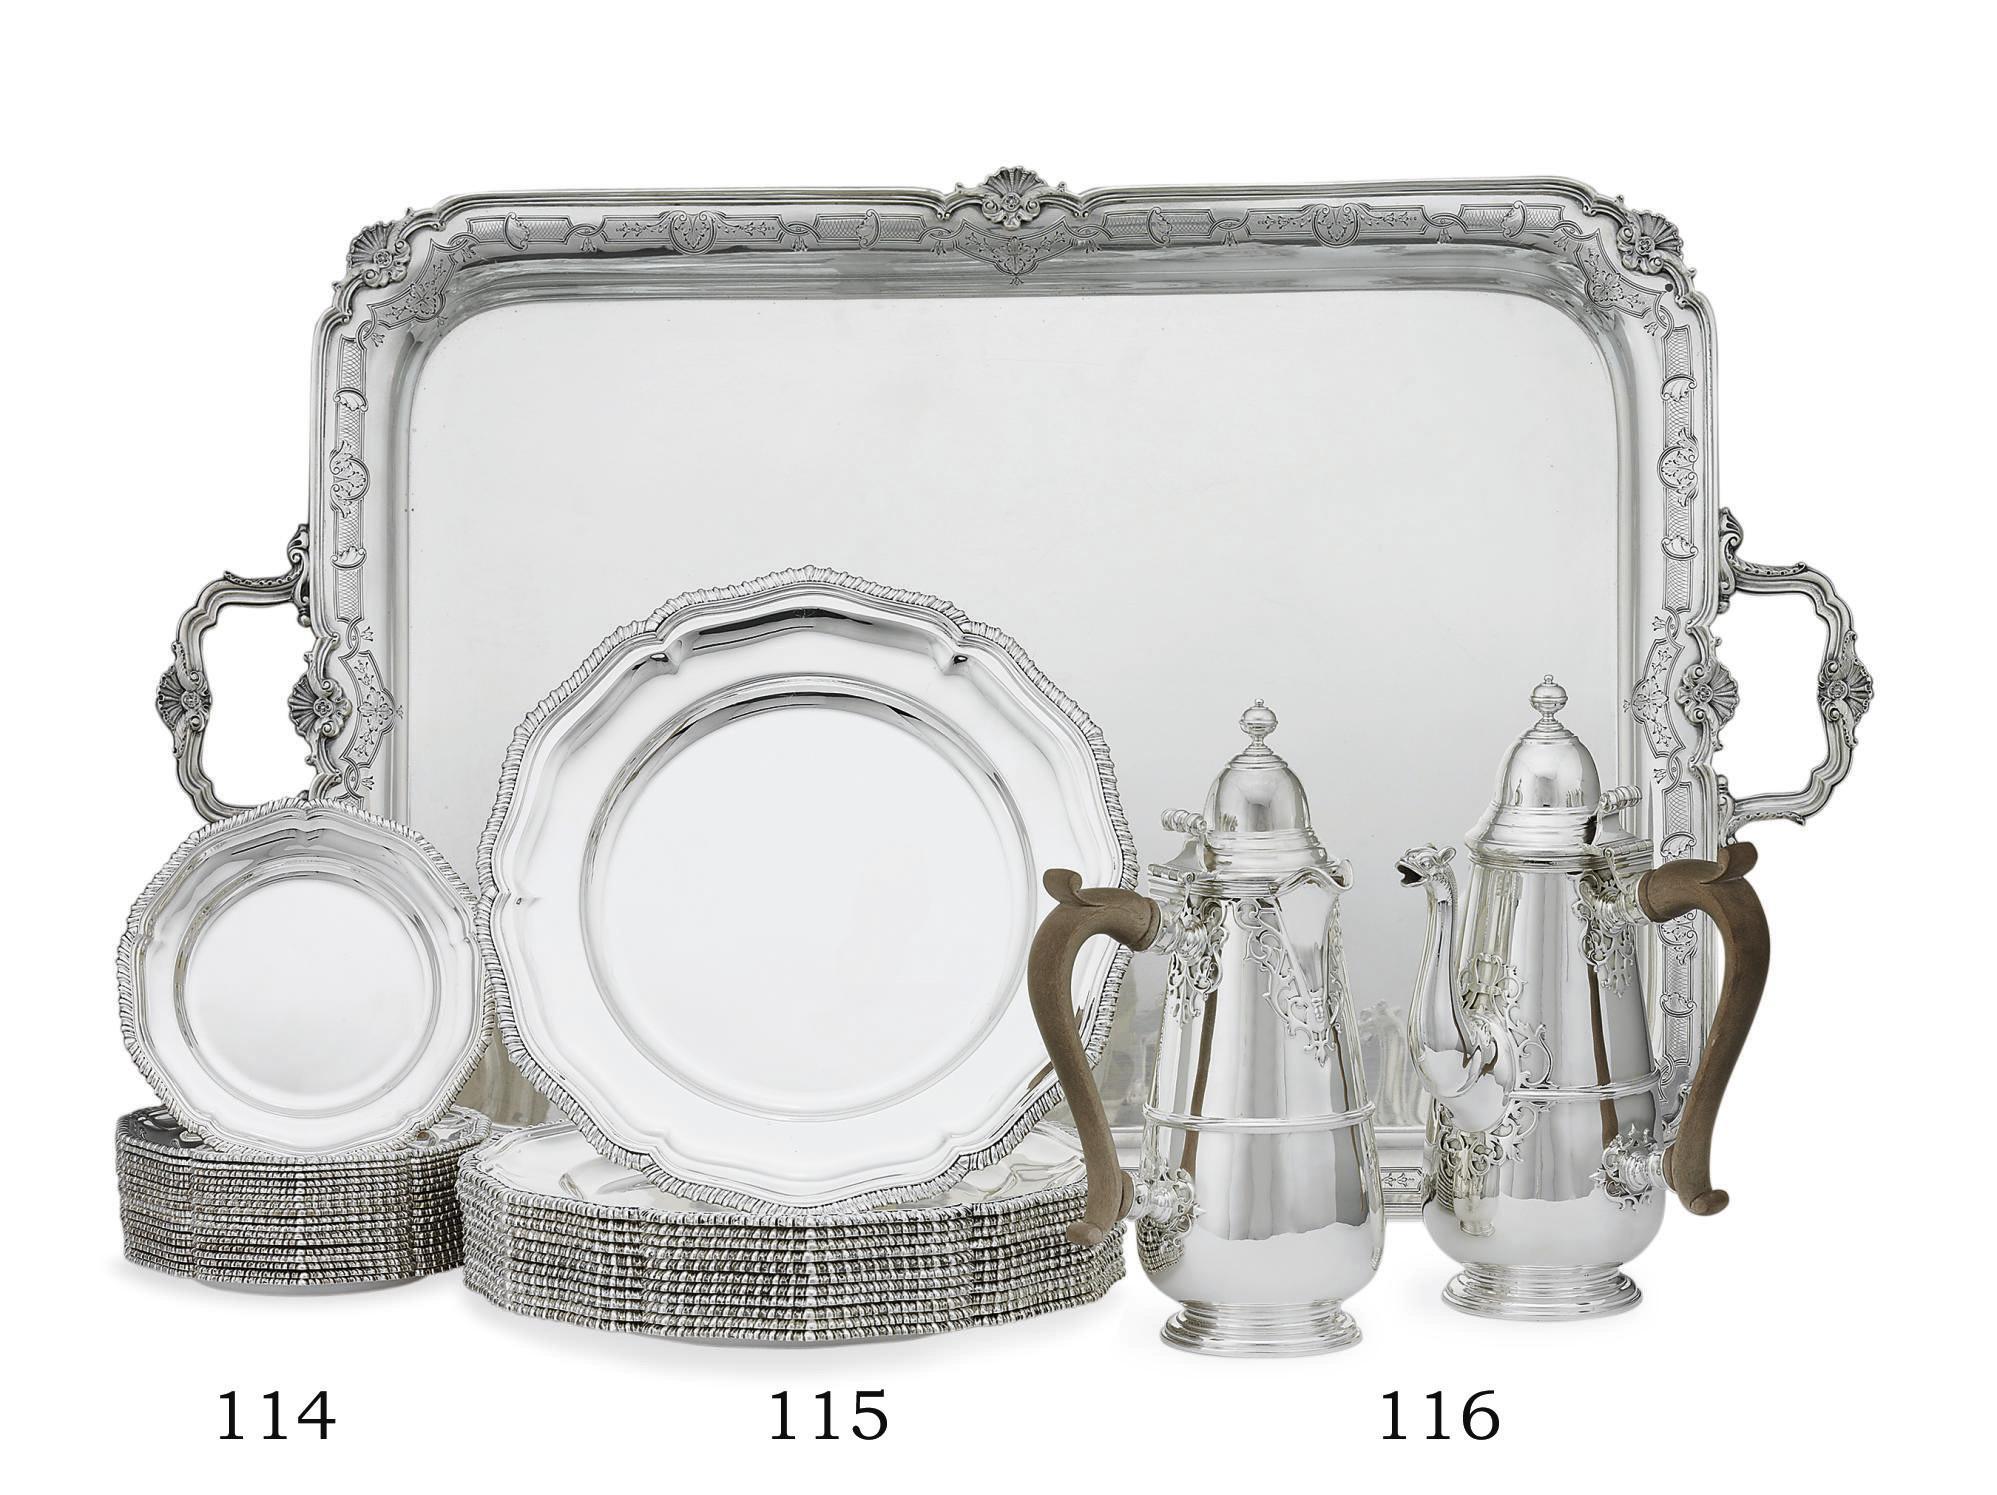 A SET OF TWELVE ELIZABETH II SILVER DINNER PLATES AND EIGHTEEN BREAD PLATES